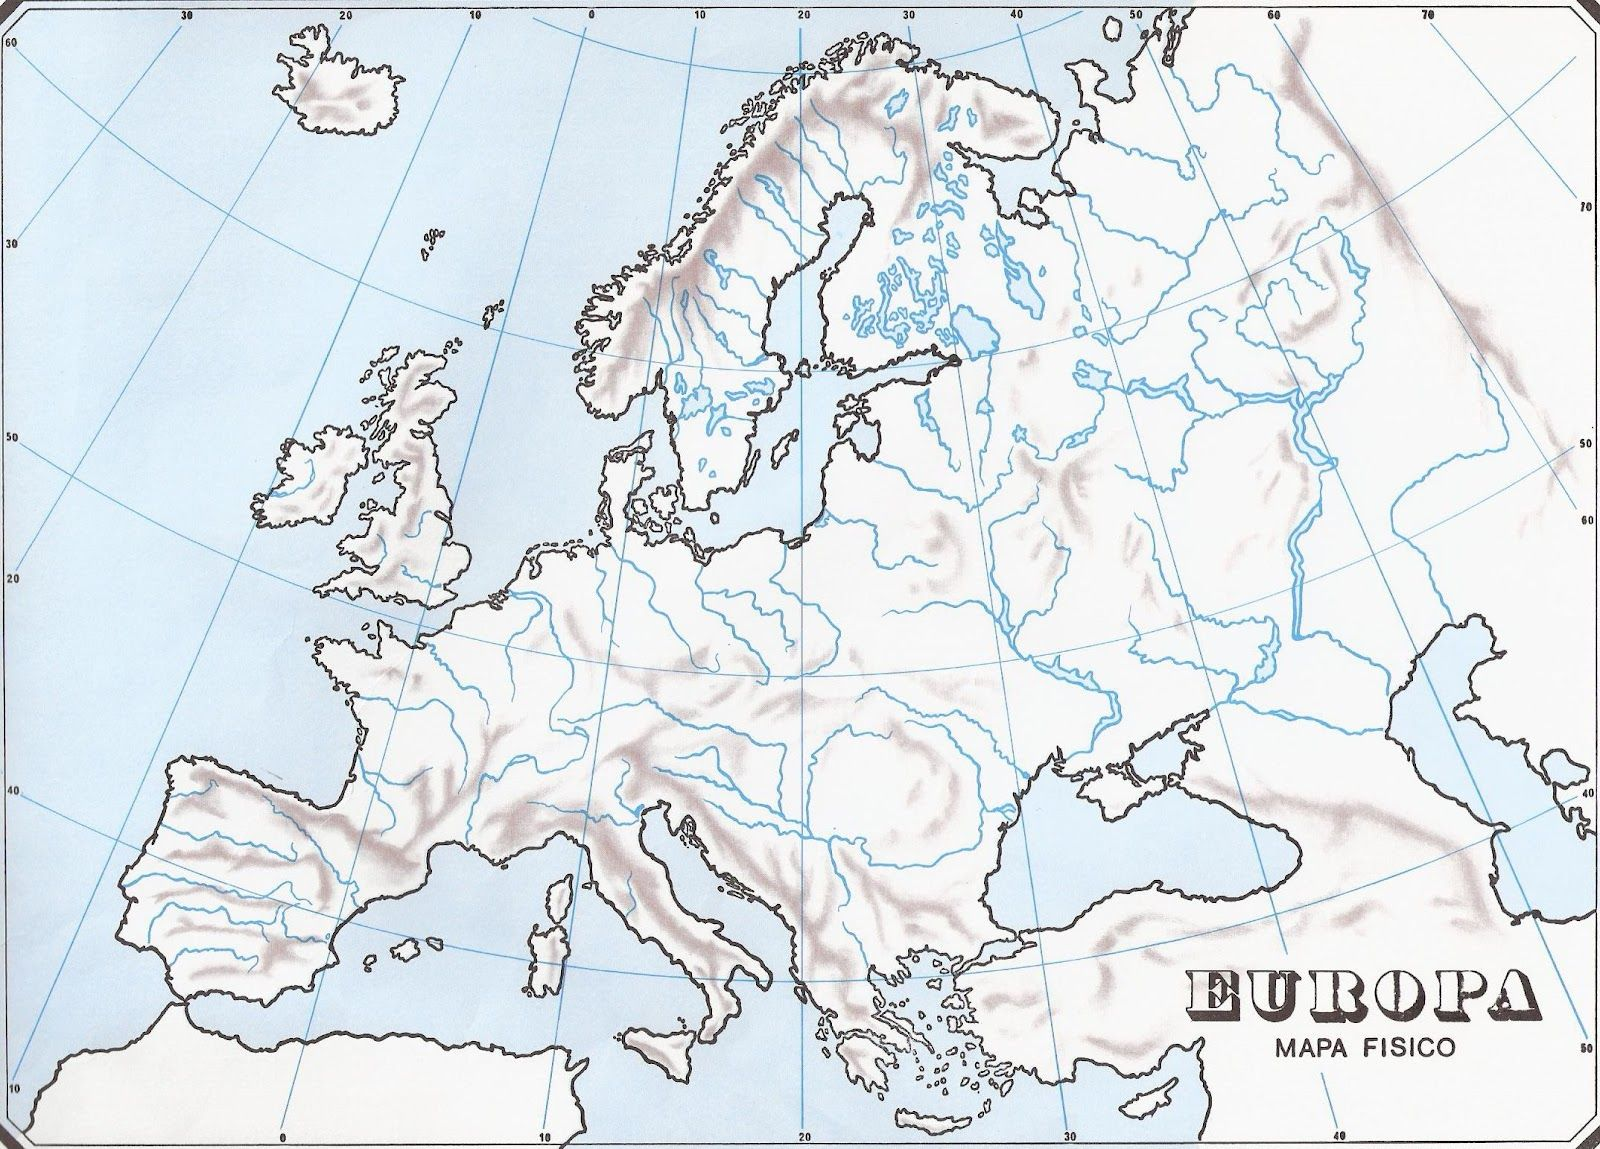 mapa mudo fisico europa imprimir - Buscar con Google | Ciencias ...